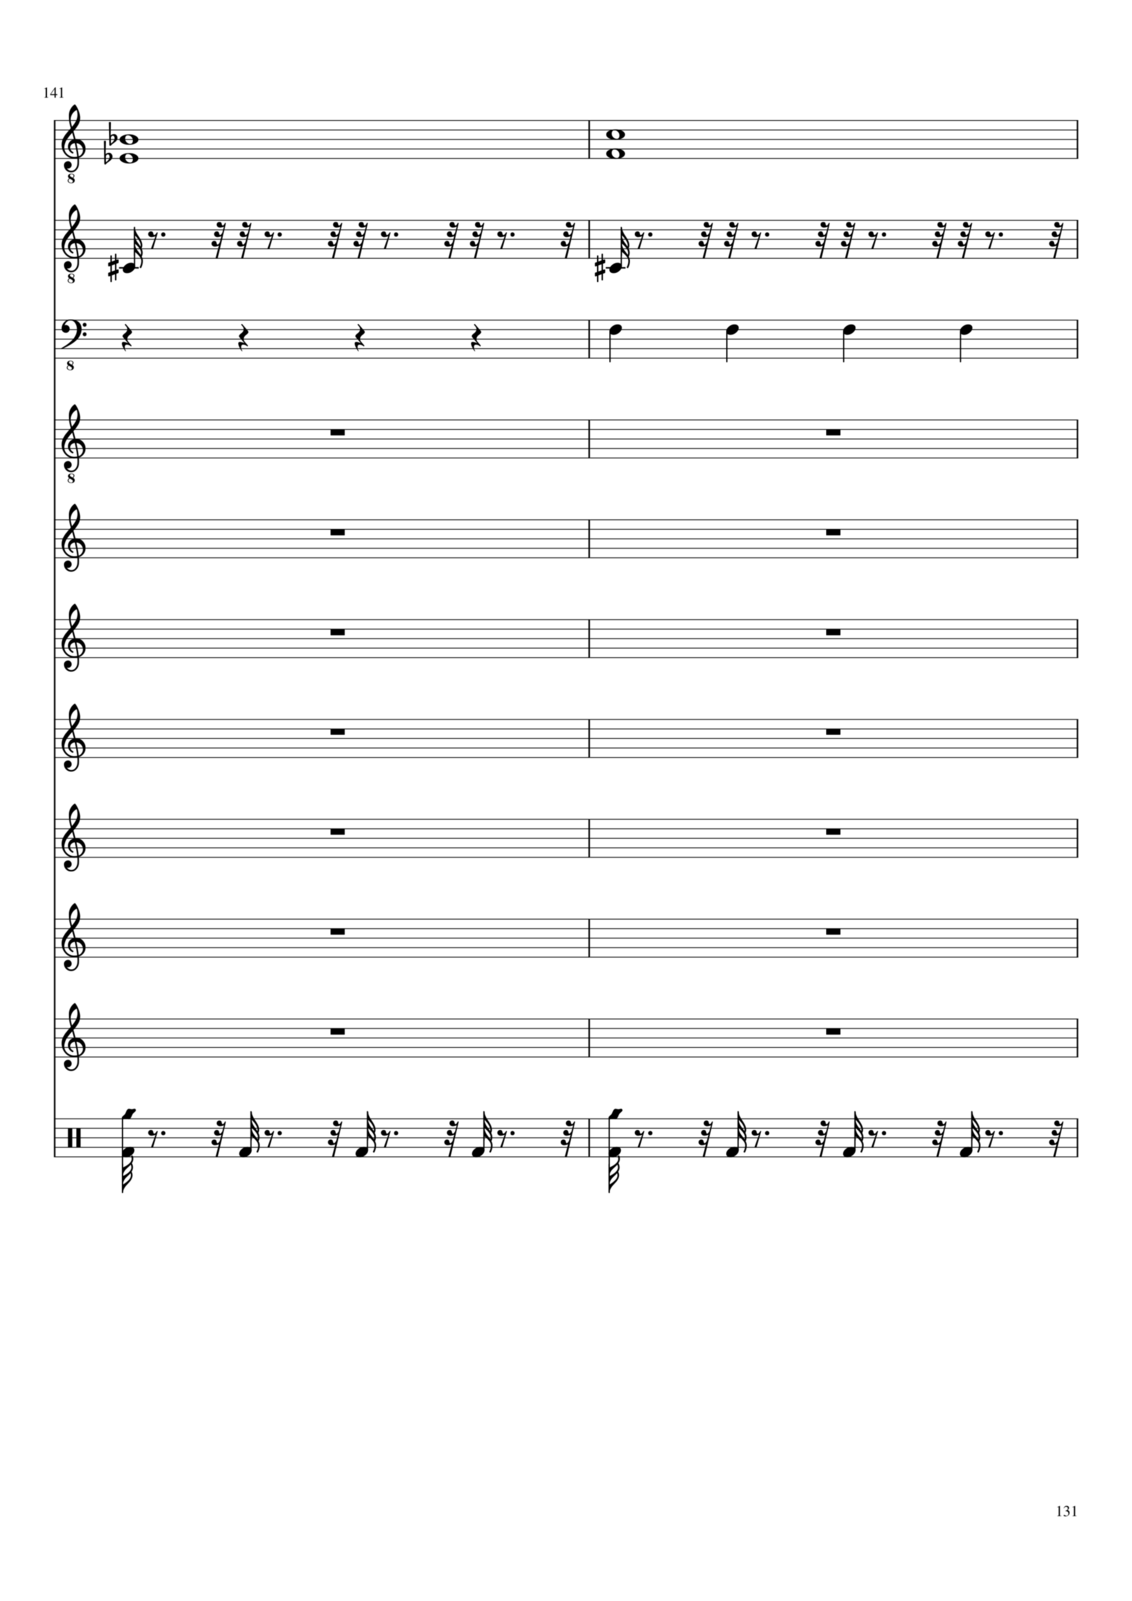 Belyiy sokol slide, Image 131